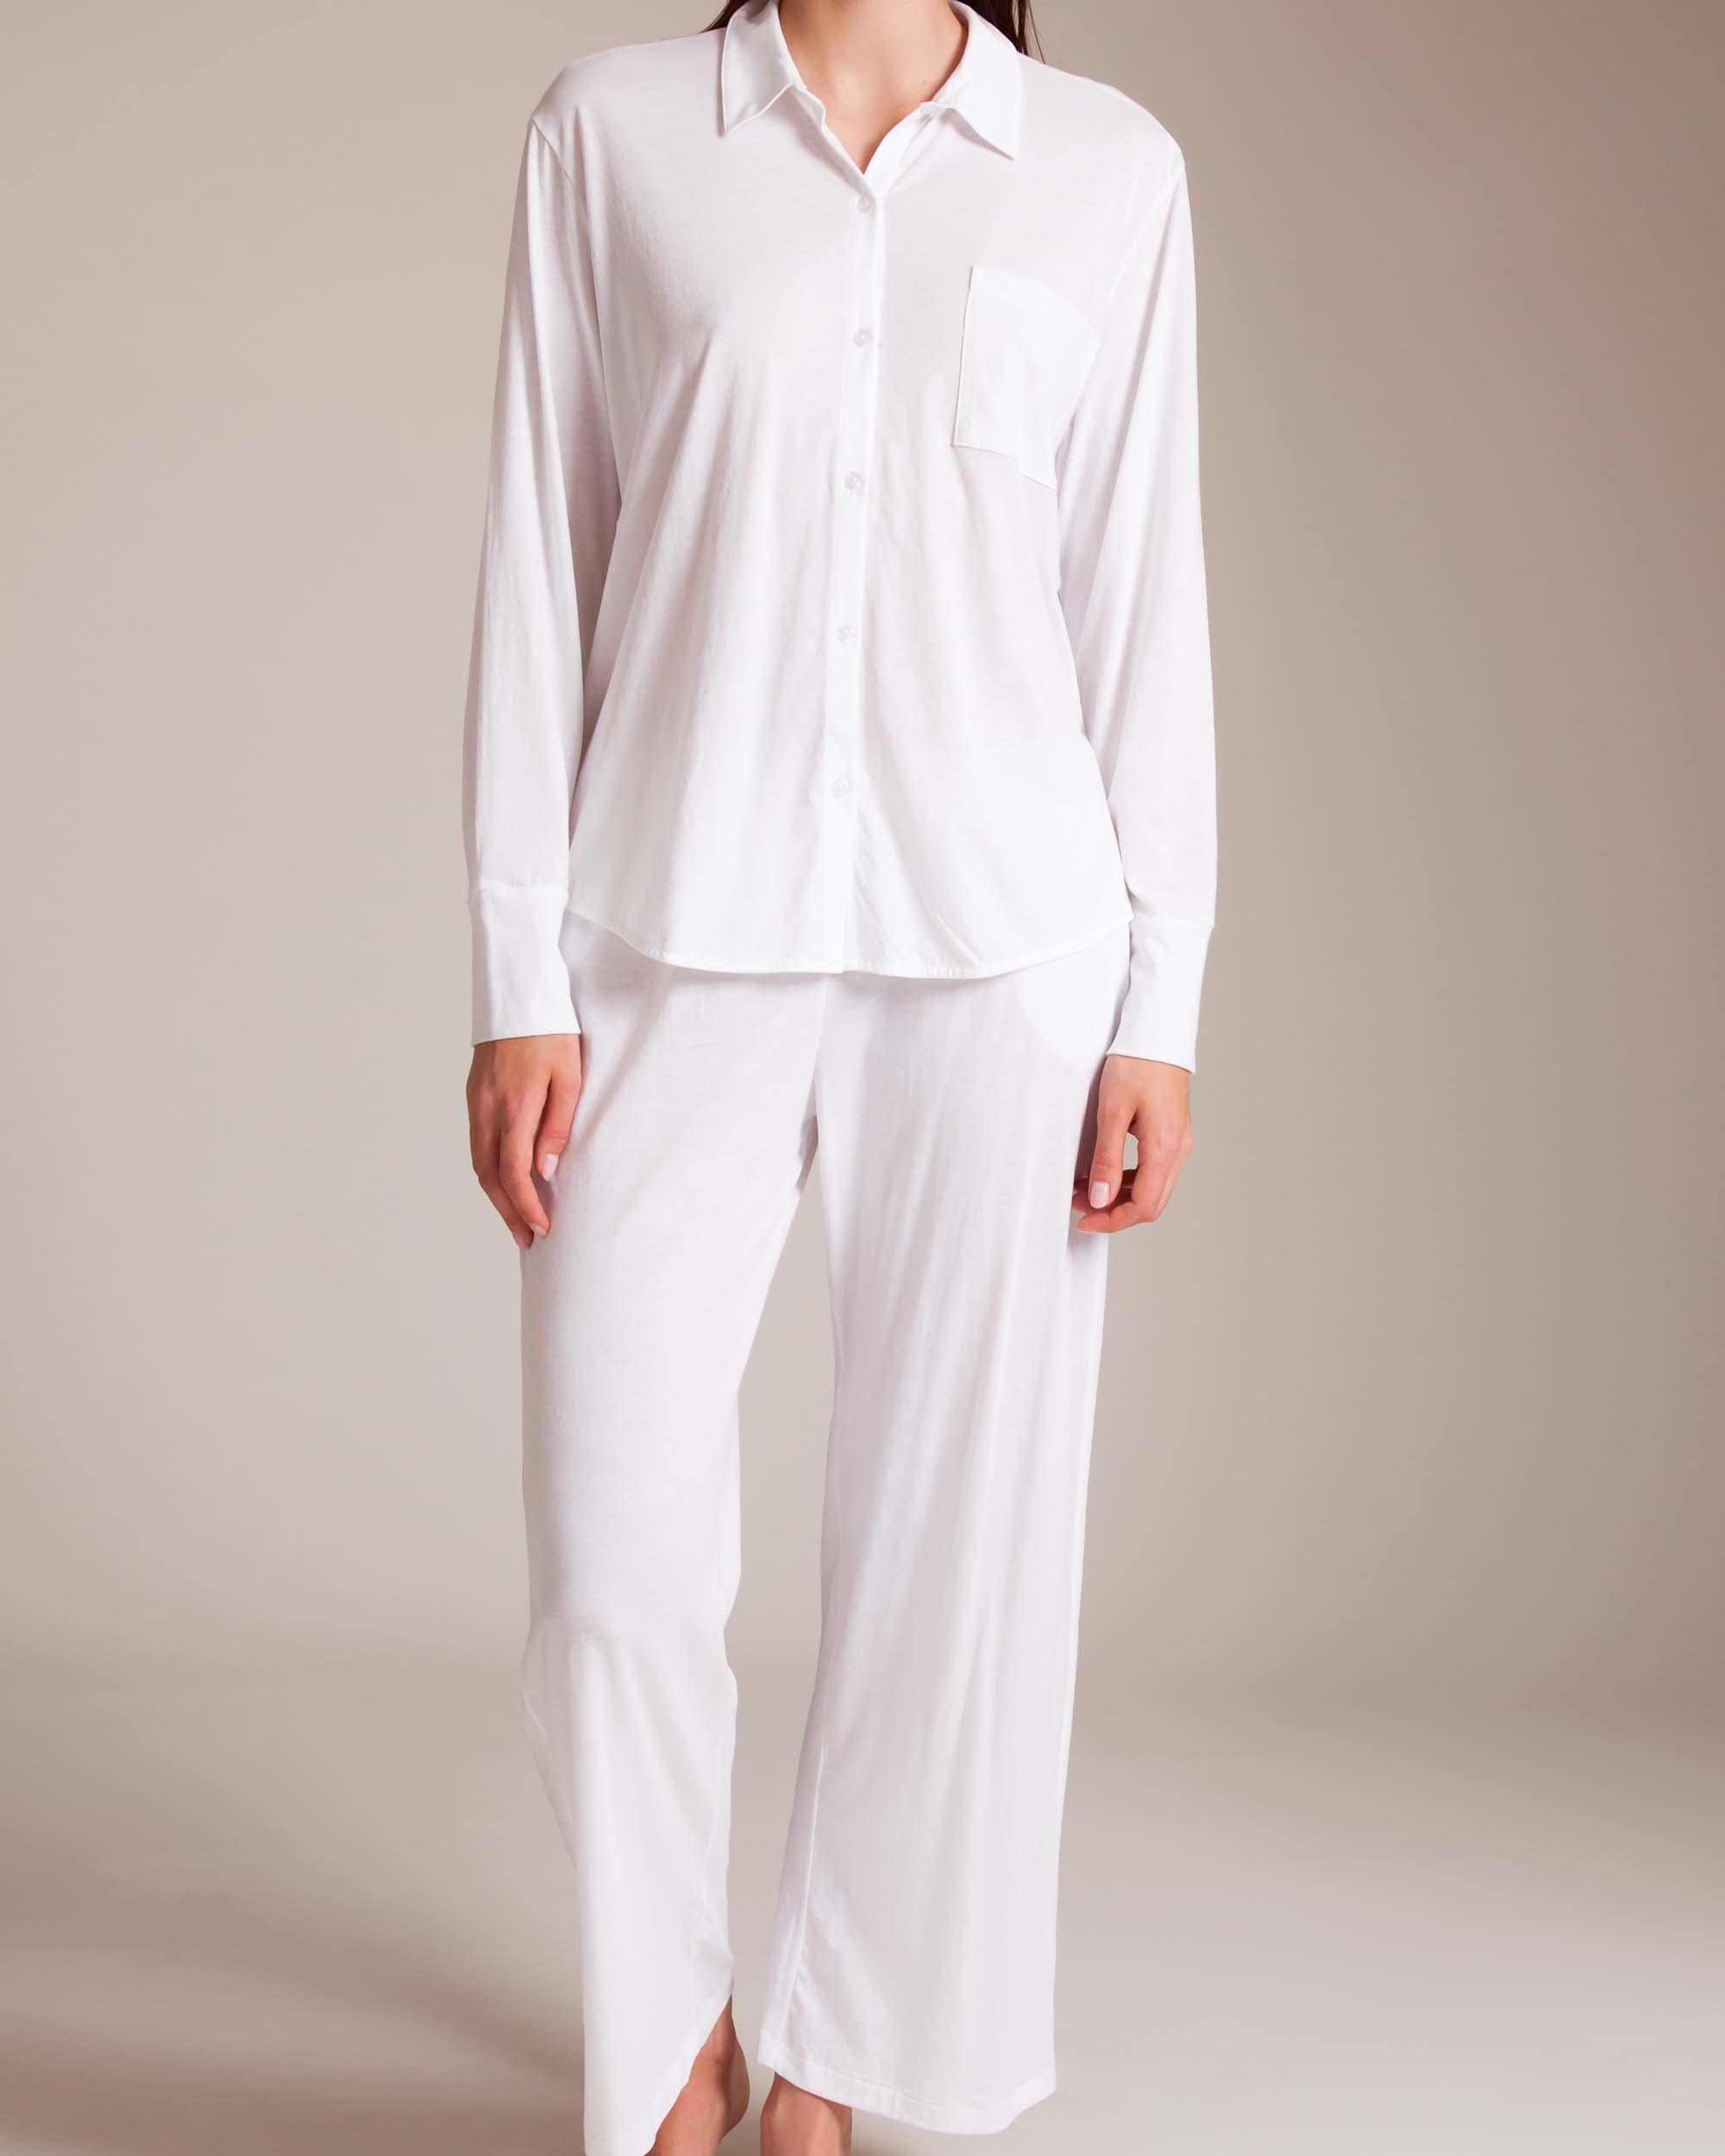 0a46522eb Skin Organic Pima Cotton Krista Kaelyn Pajama in White - Lyst